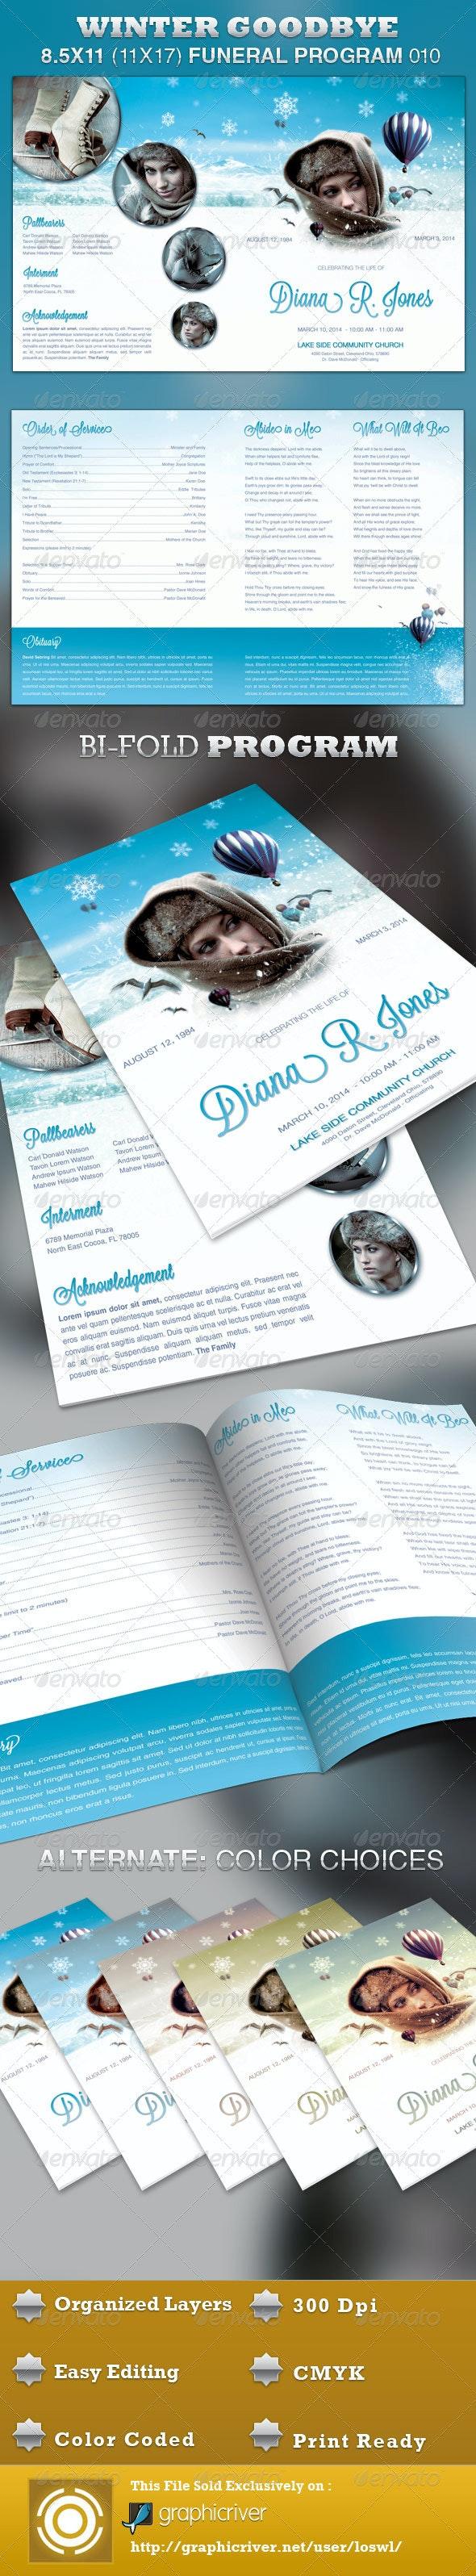 Winter Goodbye Funeral Program Template 010 - Informational Brochures